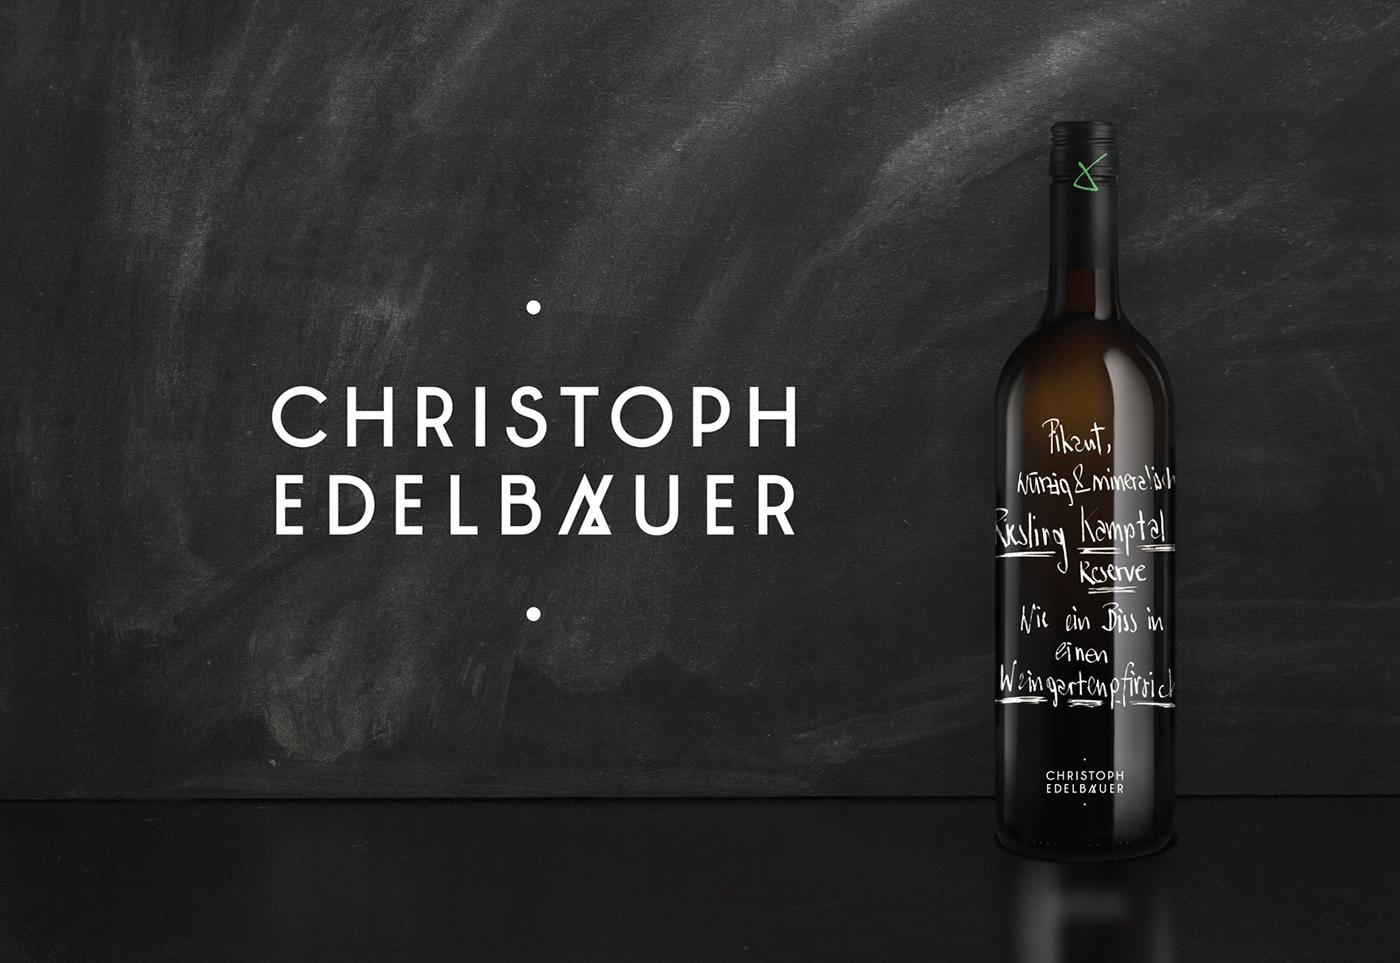 riebenbauer design christoph edelbauer austrian winery pinot noir wine label type